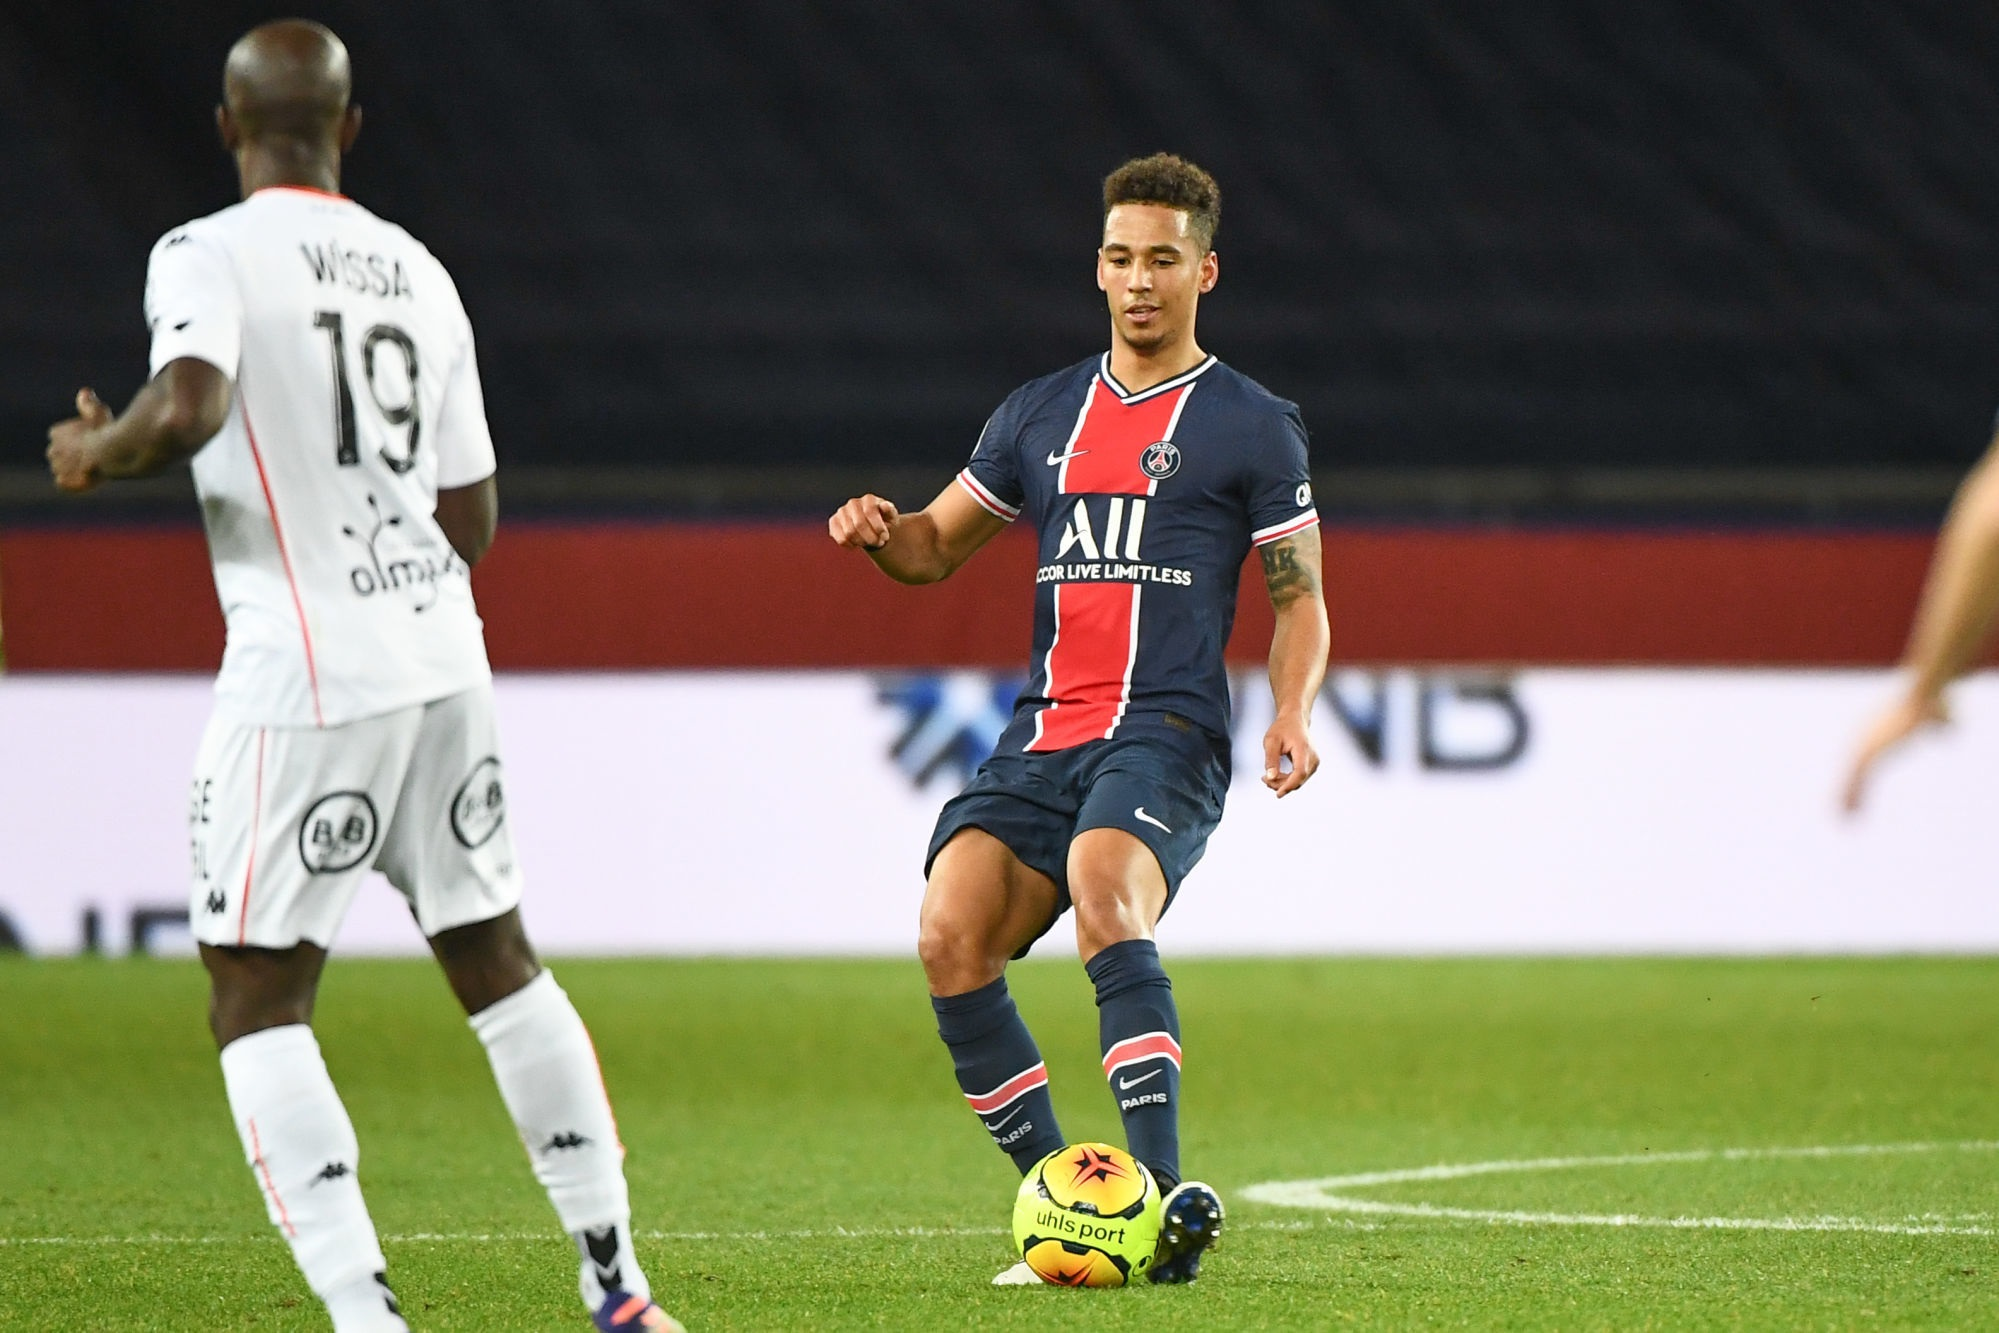 Mercato - Kehrer, Leverkusen capable de payer 15-20 millions d'euros confirme Sky Sports